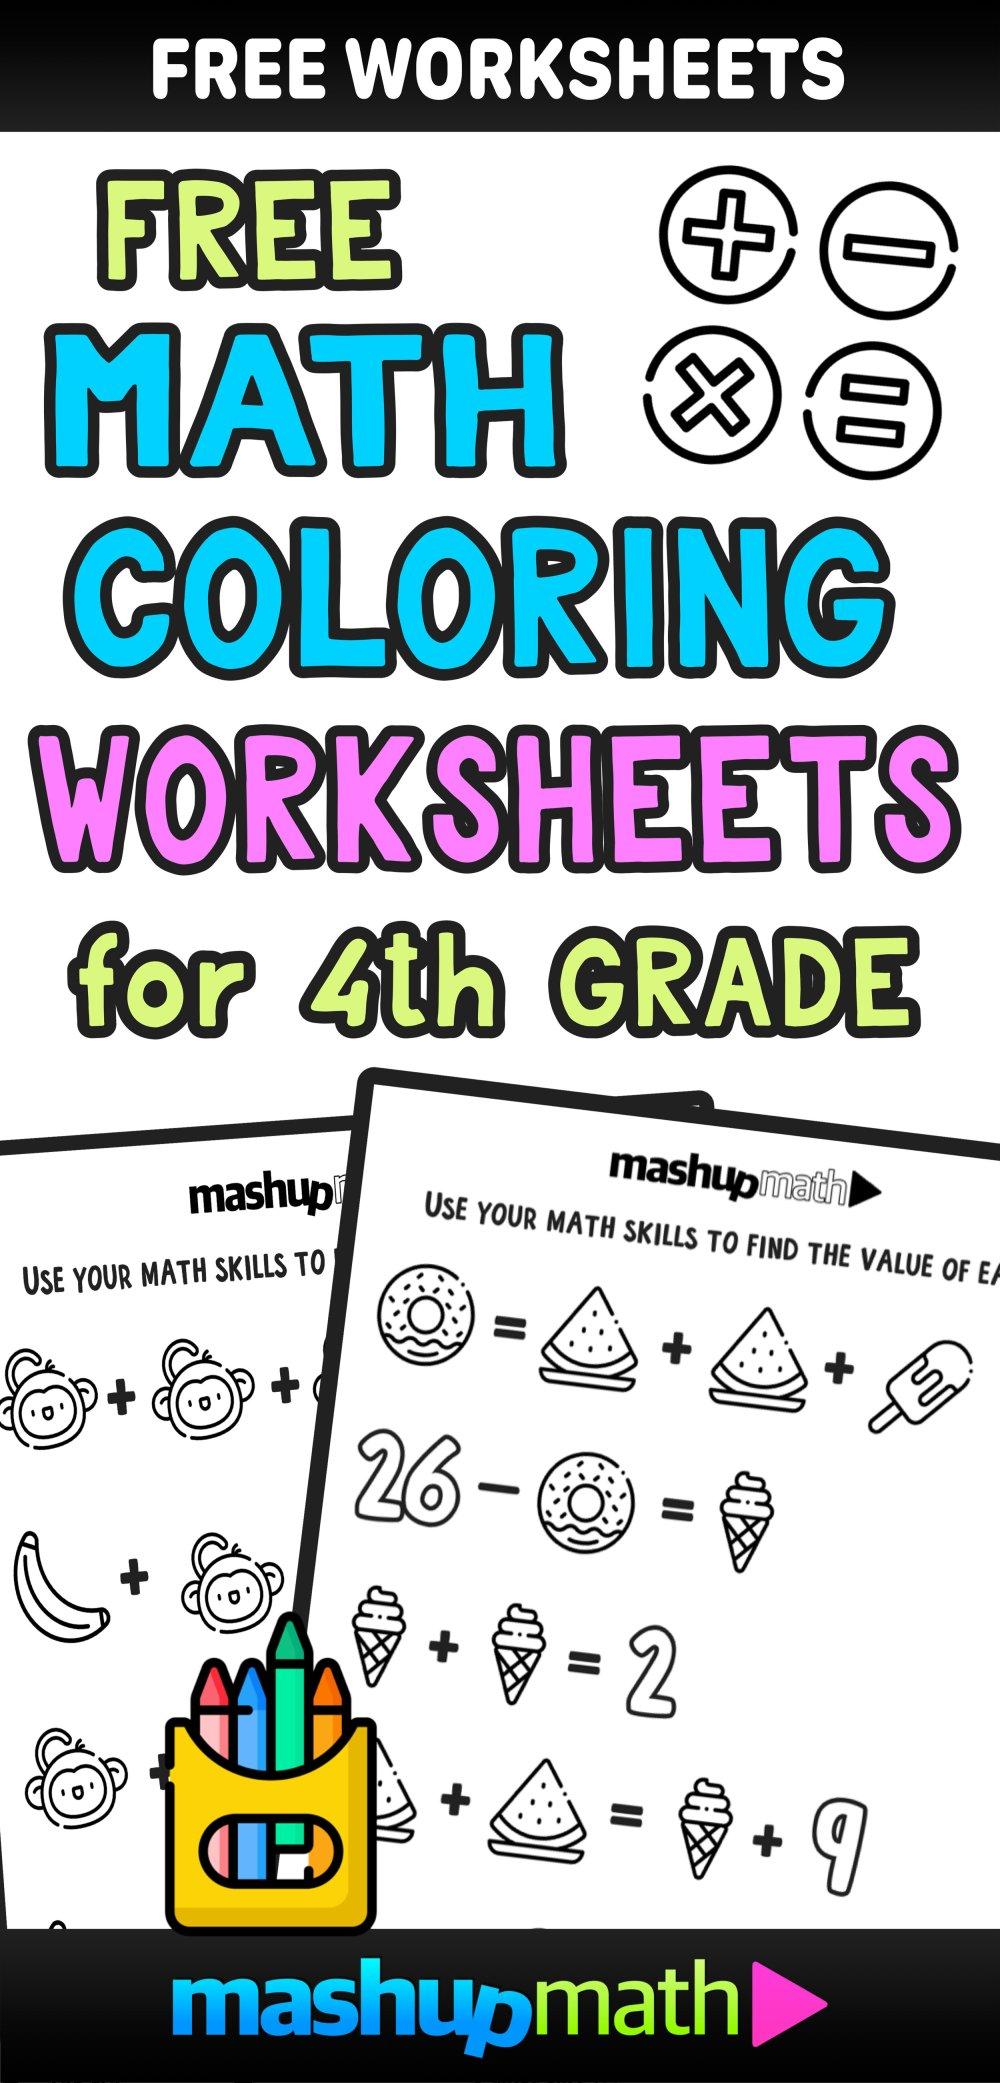 medium resolution of Free Math Coloring Worksheets for 3rd and 4th Grade — Mashup Math